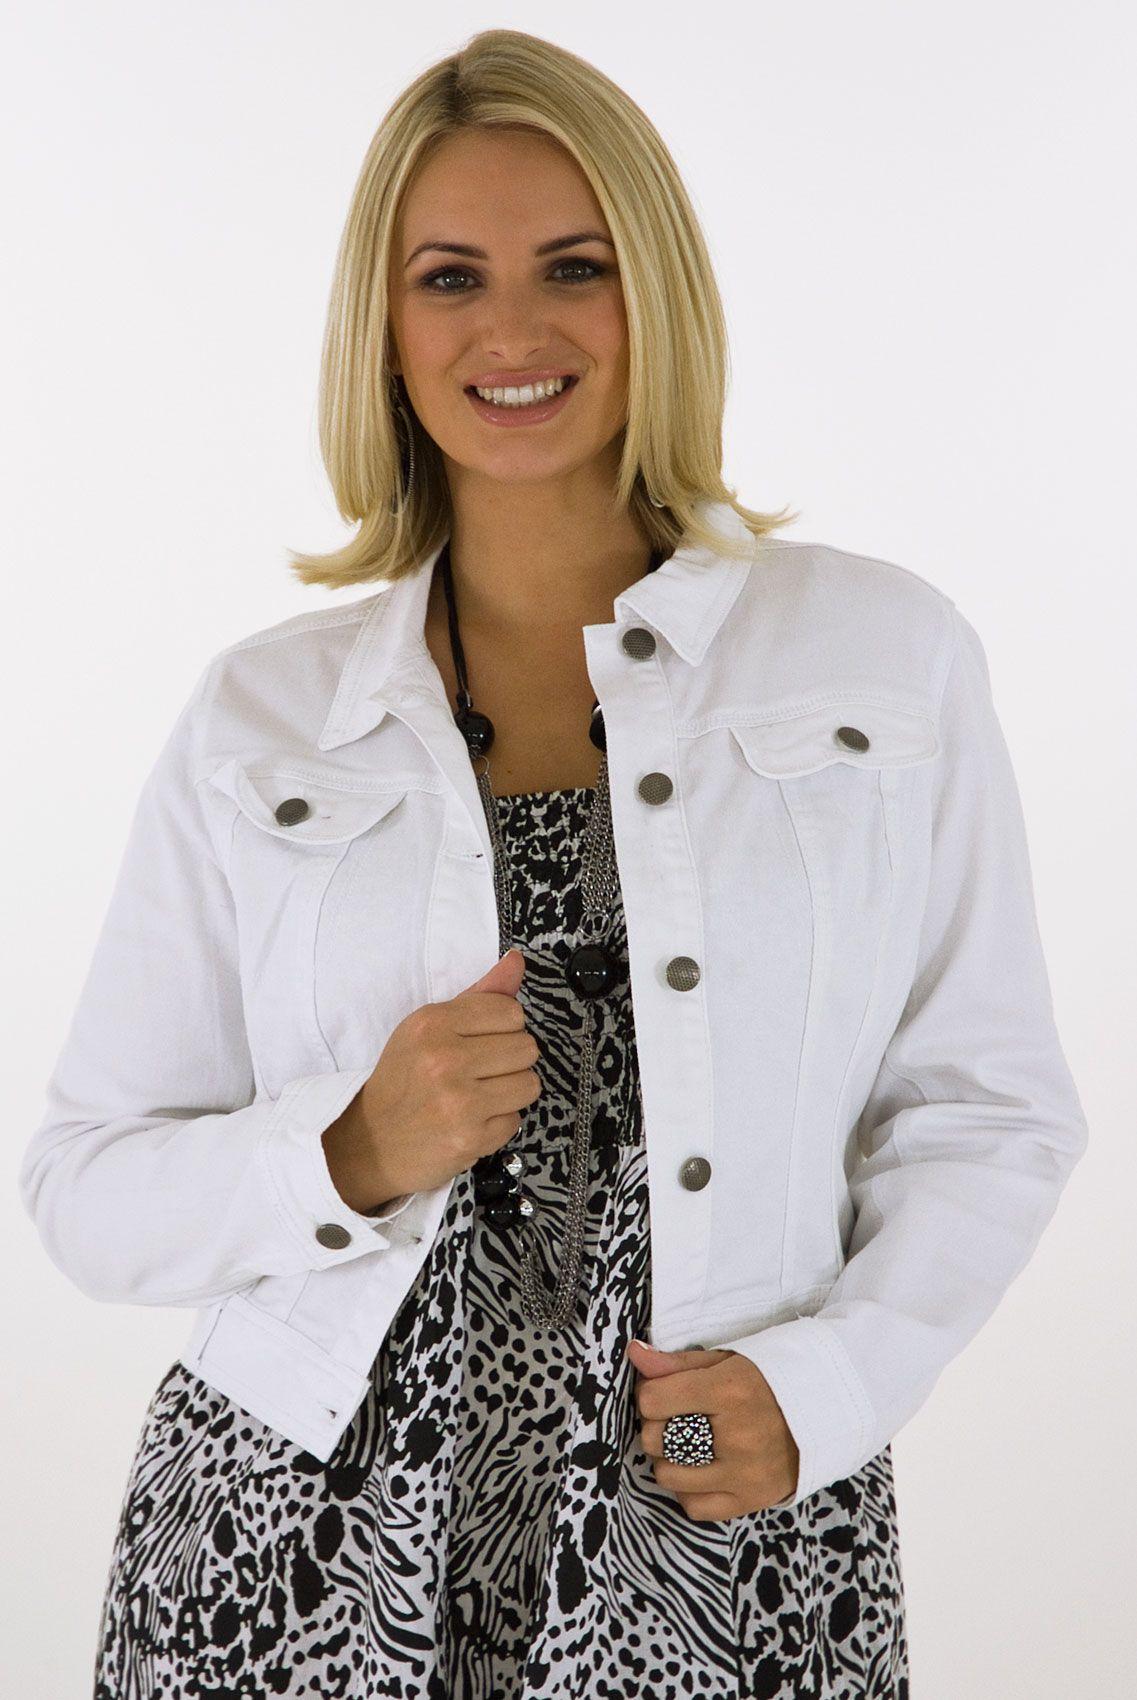 Image Detail For White Denim Jacket Plus Size 16 18 20 22 24 26 28 30 32 Fashion Clothes Women Jackets For Women Casual Women [ 1700 x 1137 Pixel ]